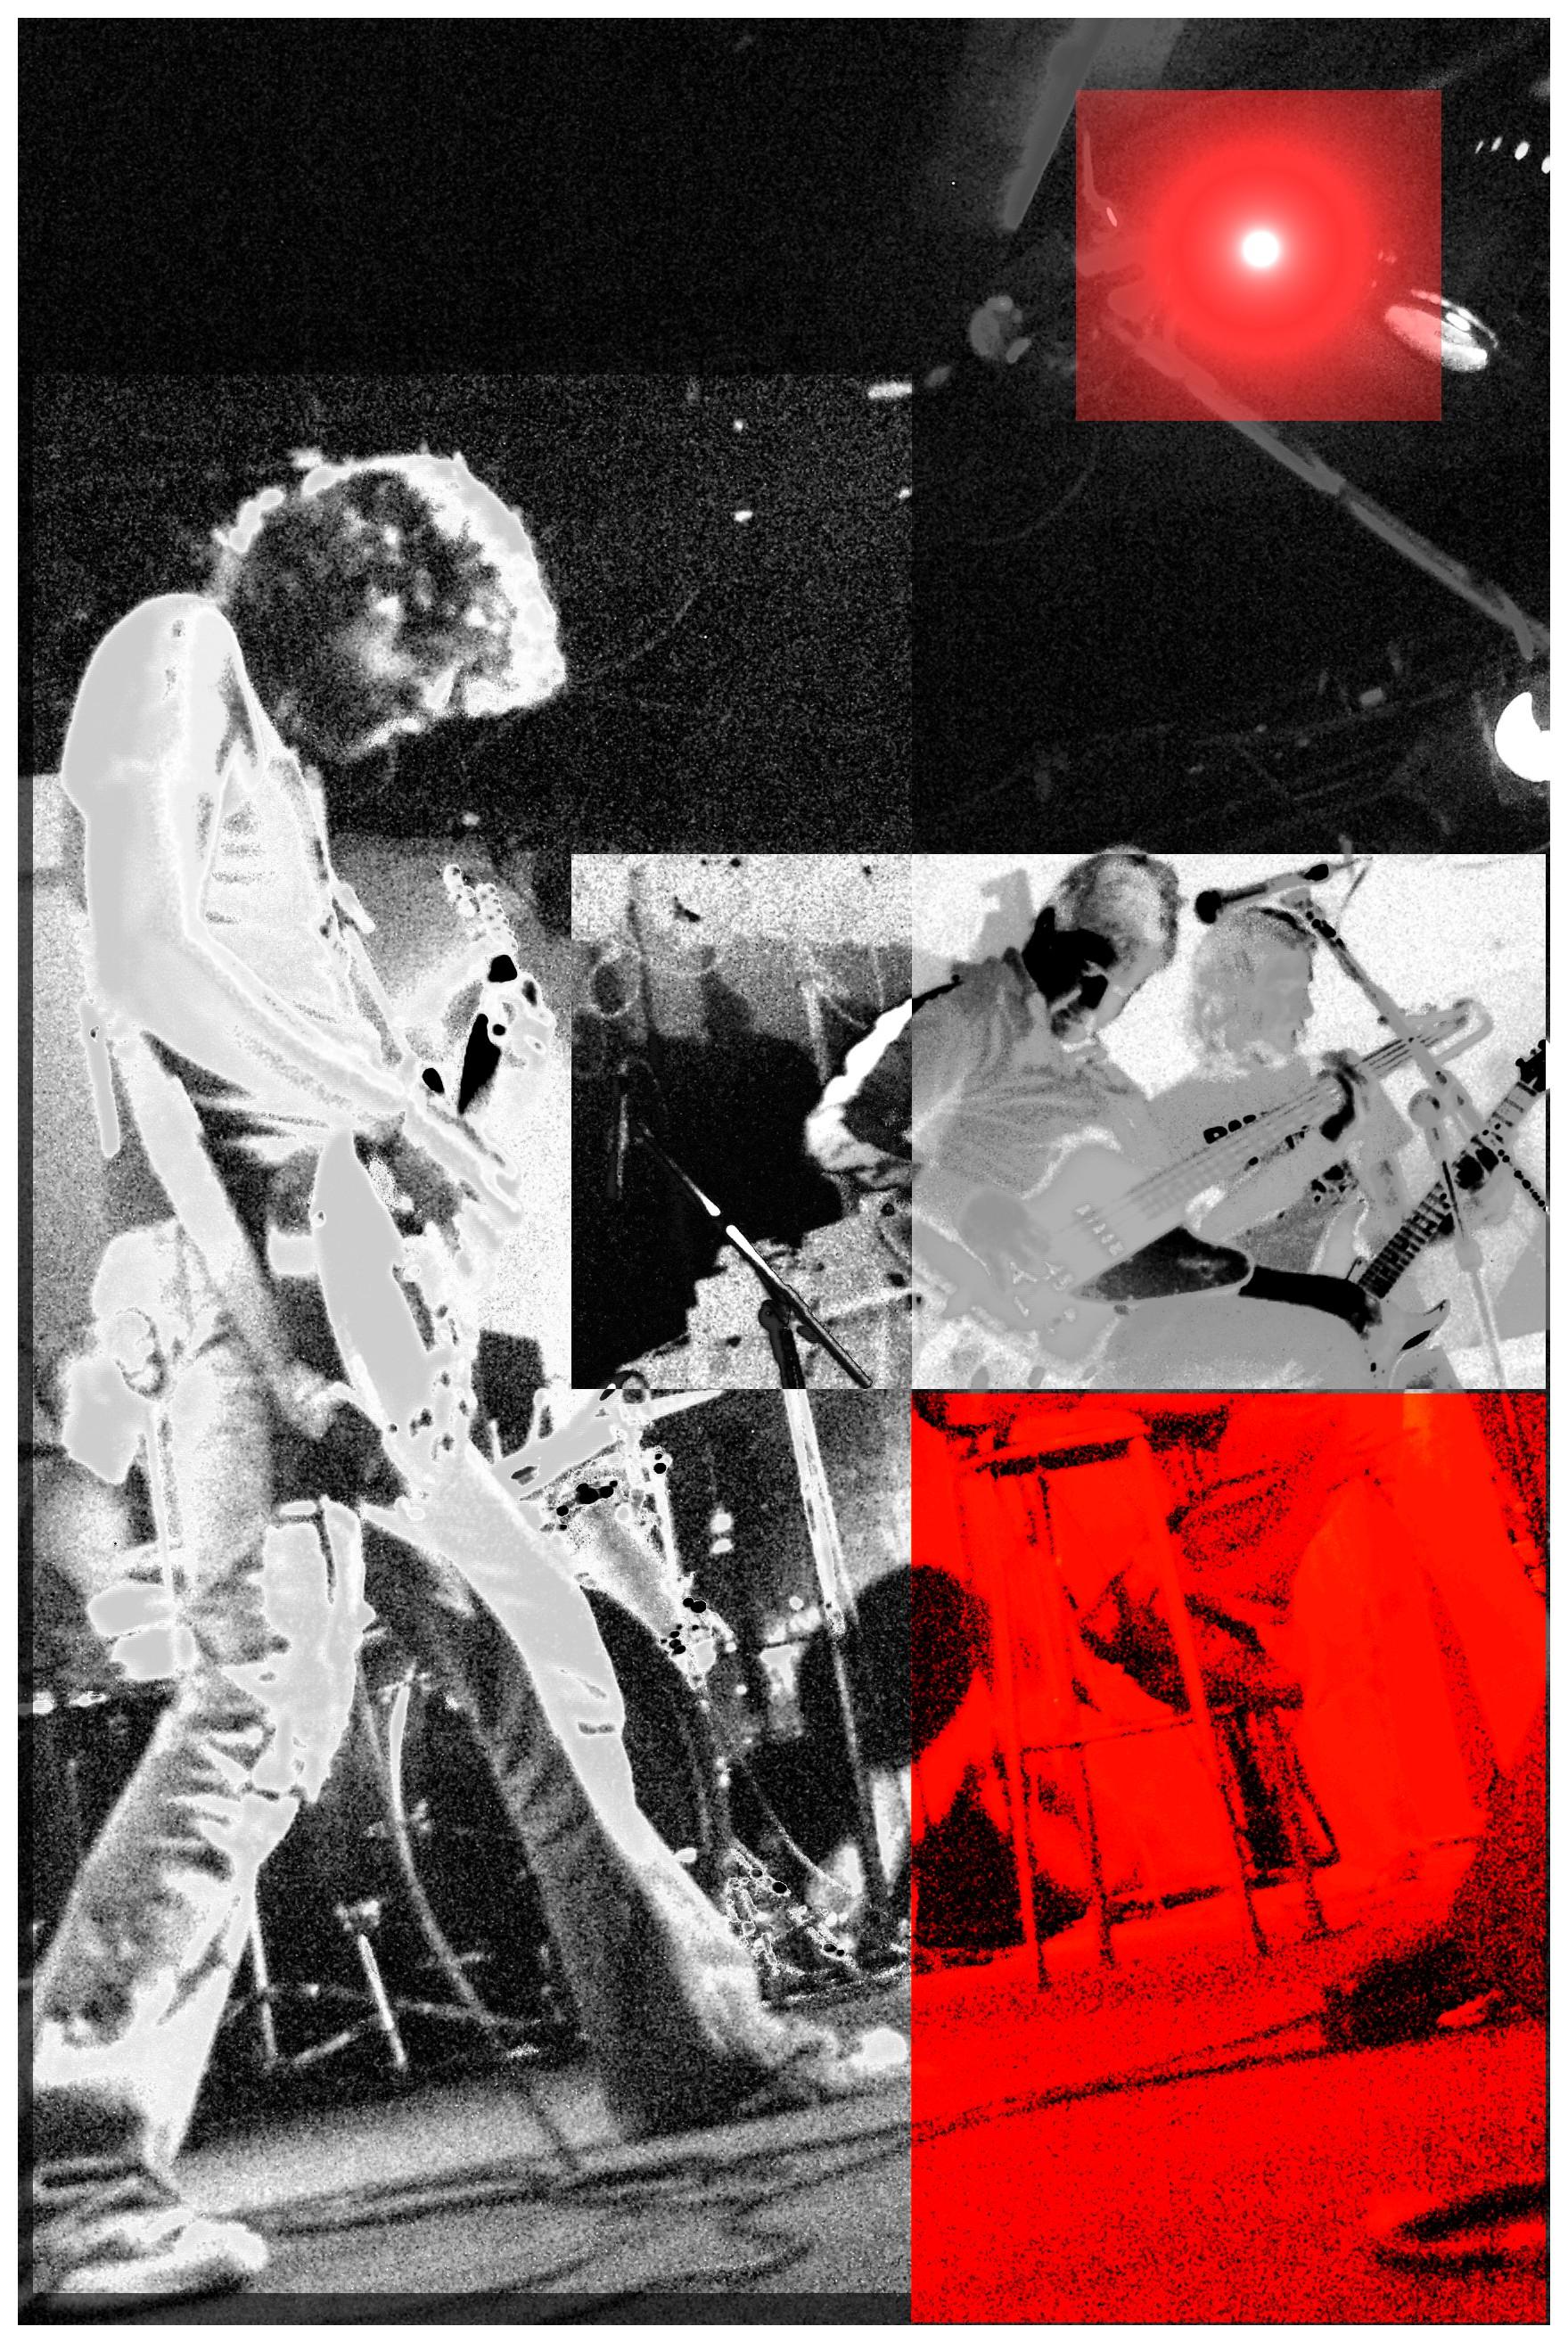 Holy Rock, Abstract, Band, Bspo06, Grainy, HQ Photo